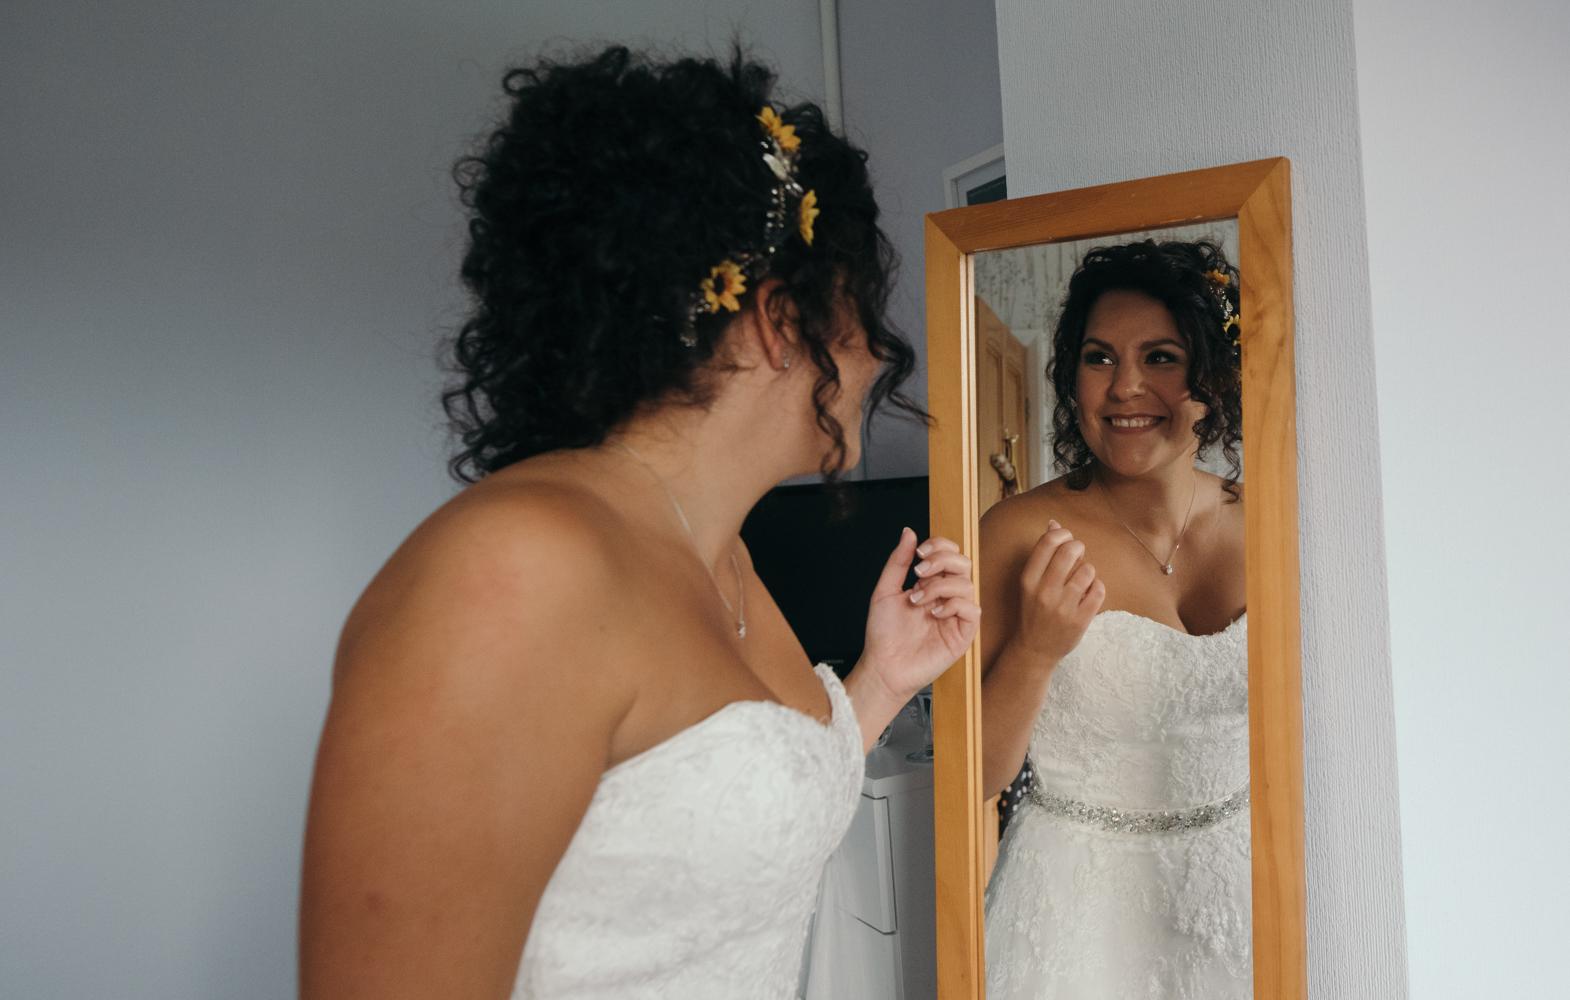 The bride admiring her look in the mirror wearing her wedding dress